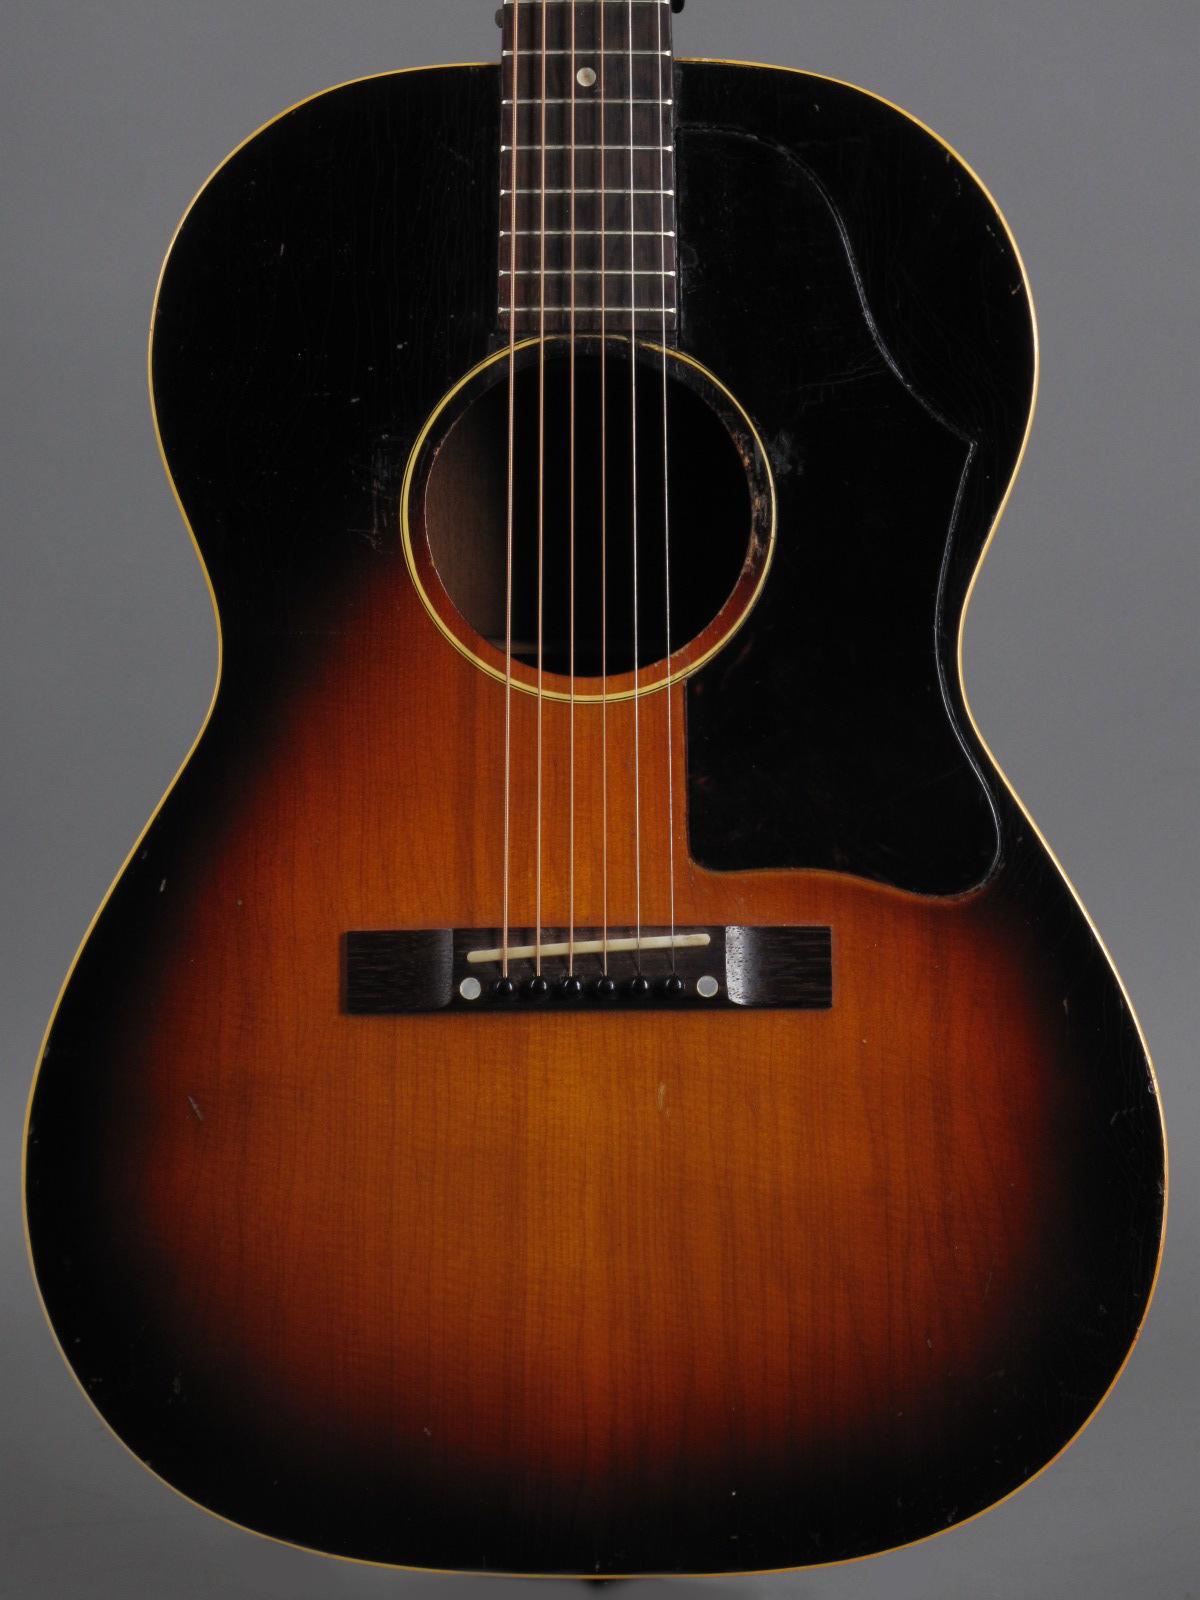 1958 Gibson LG-1 - Sunburst